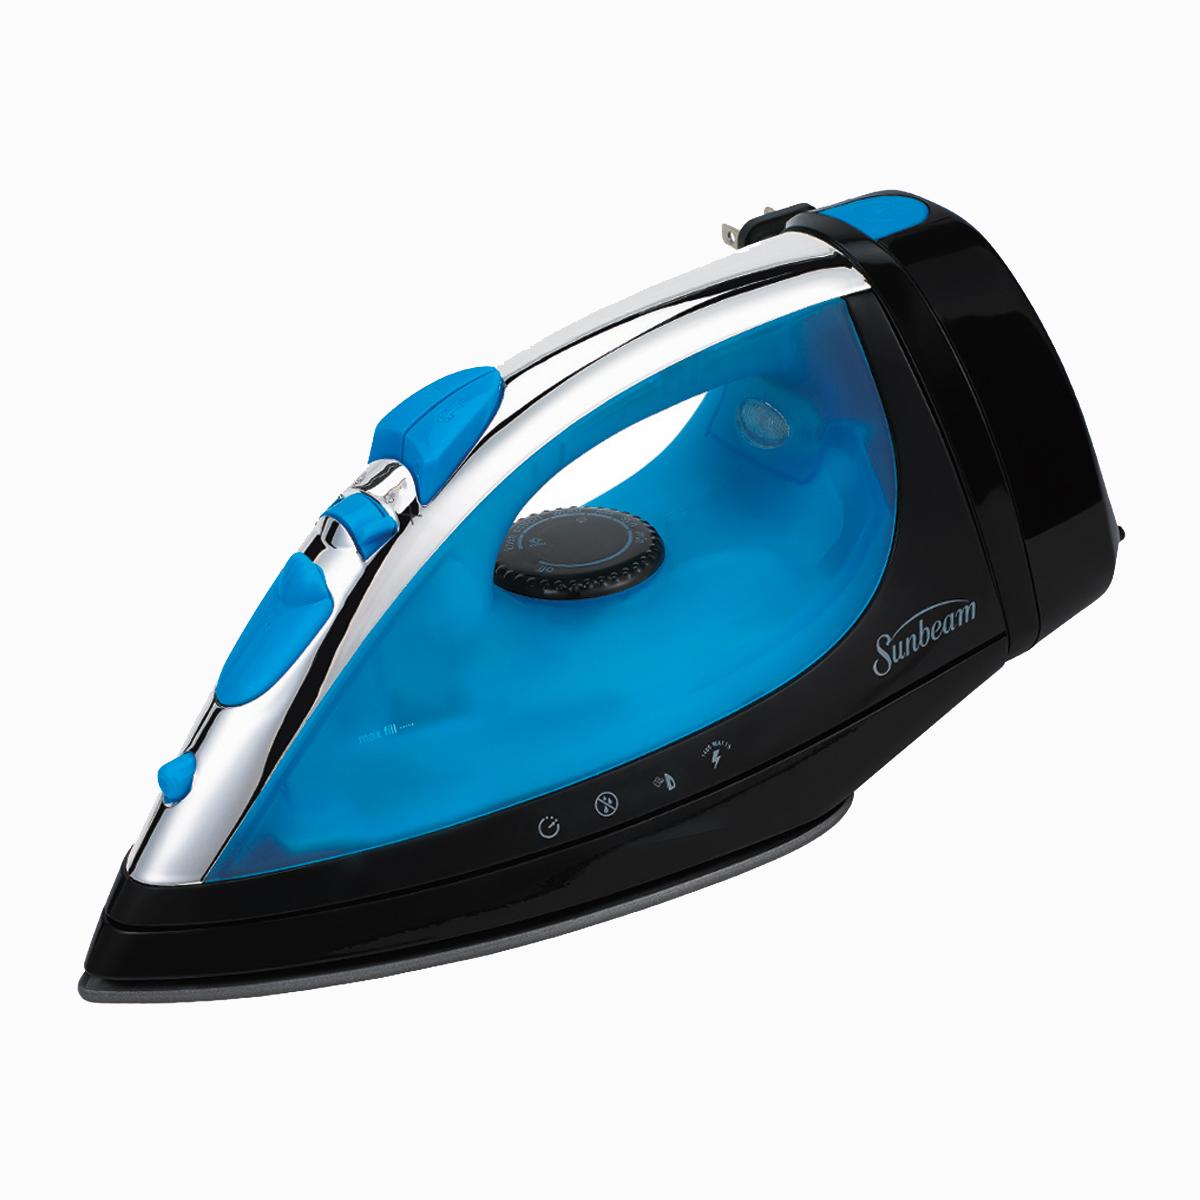 Sunbeam® Steam Master® Iron, Blue & Grey